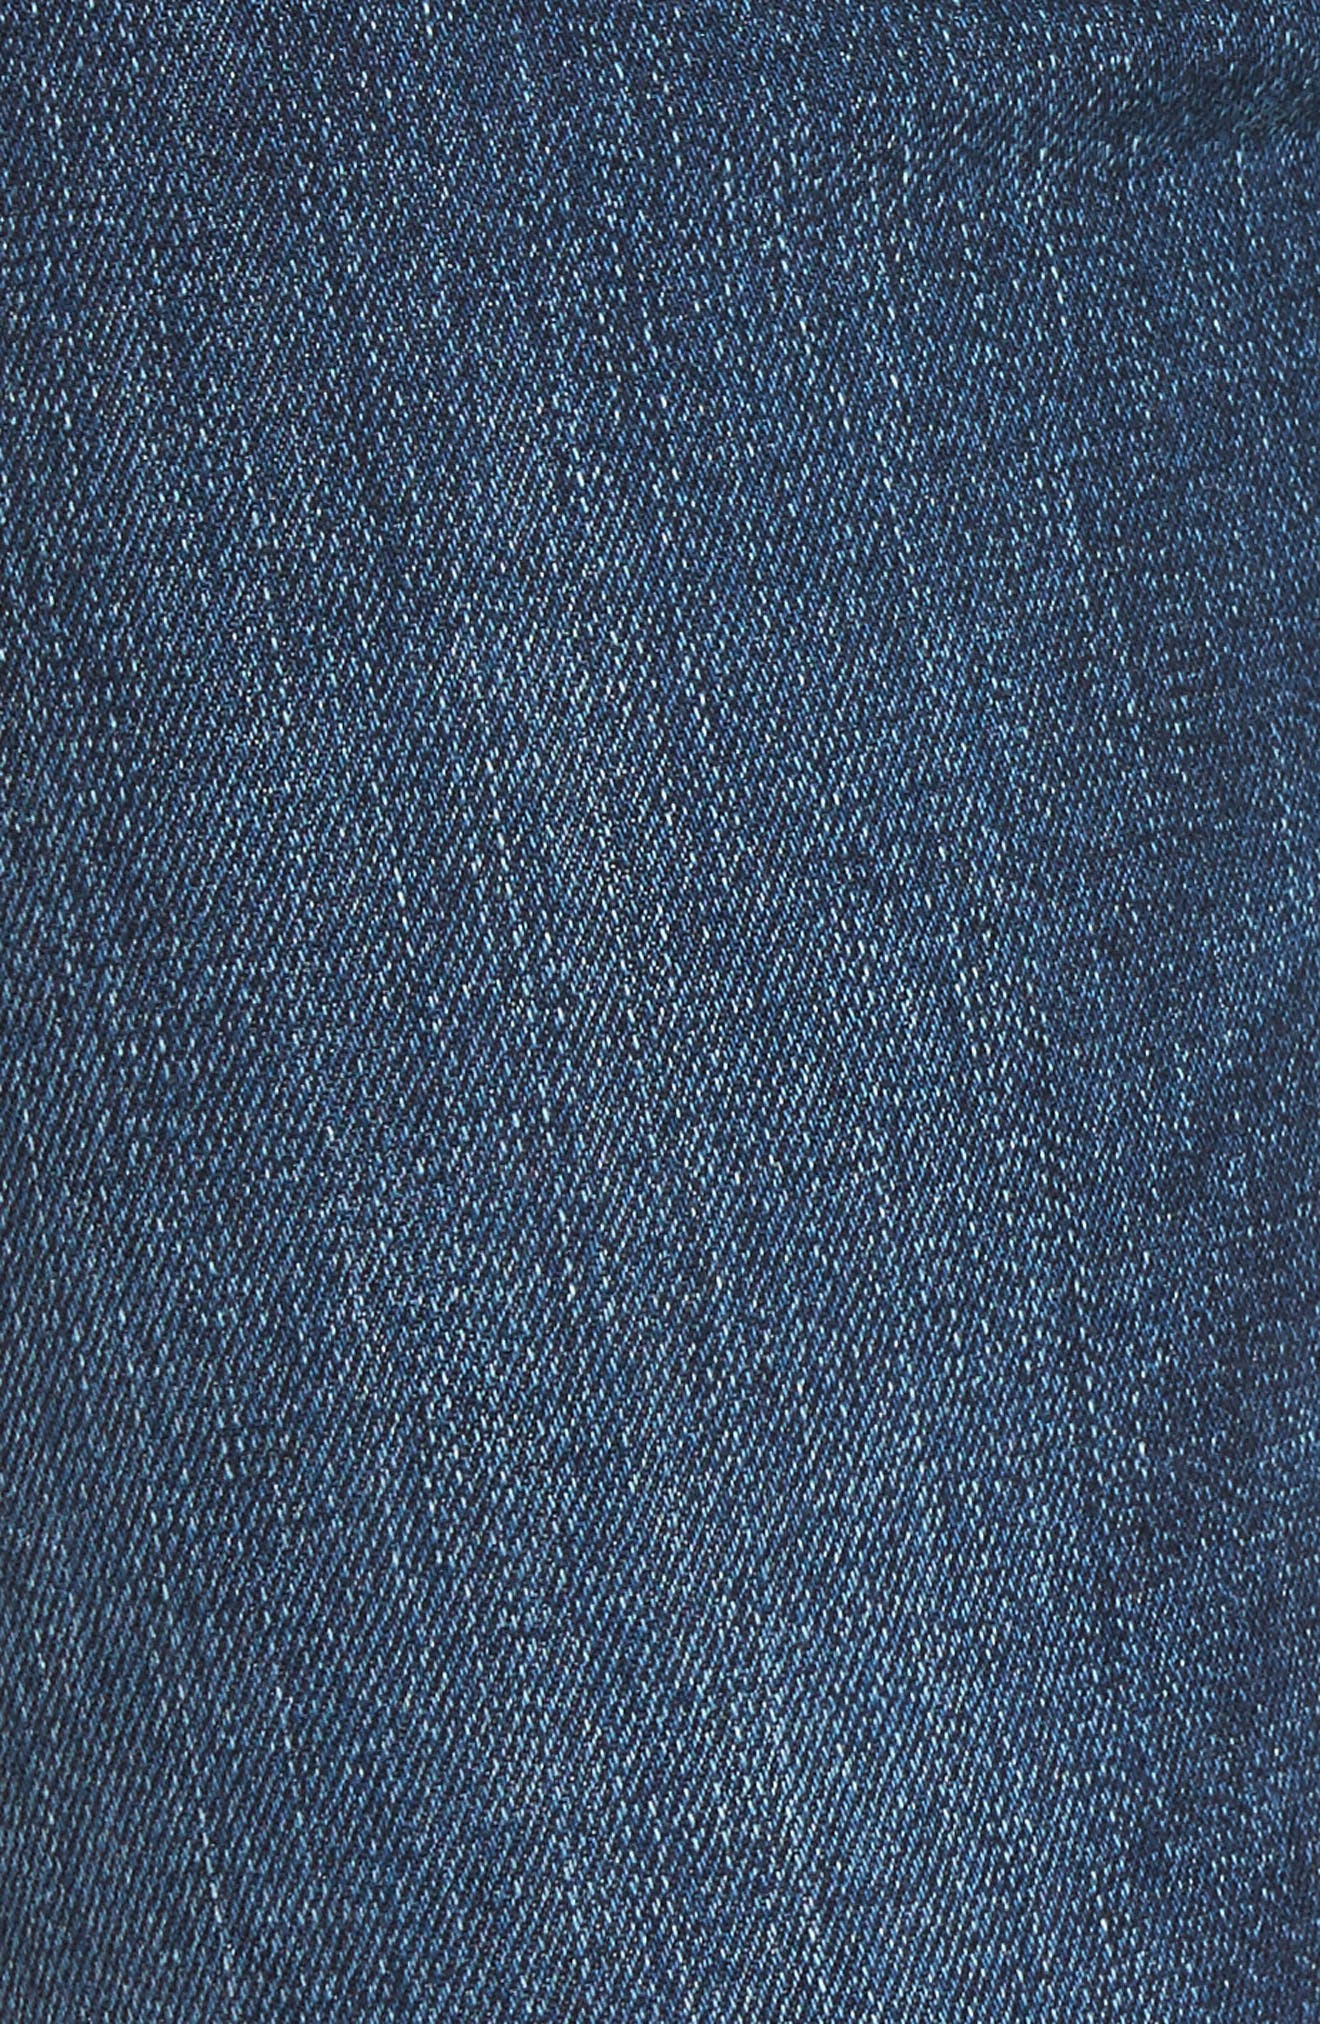 Barbara High Waist Super Skinny Jeans,                             Alternate thumbnail 6, color,                             400